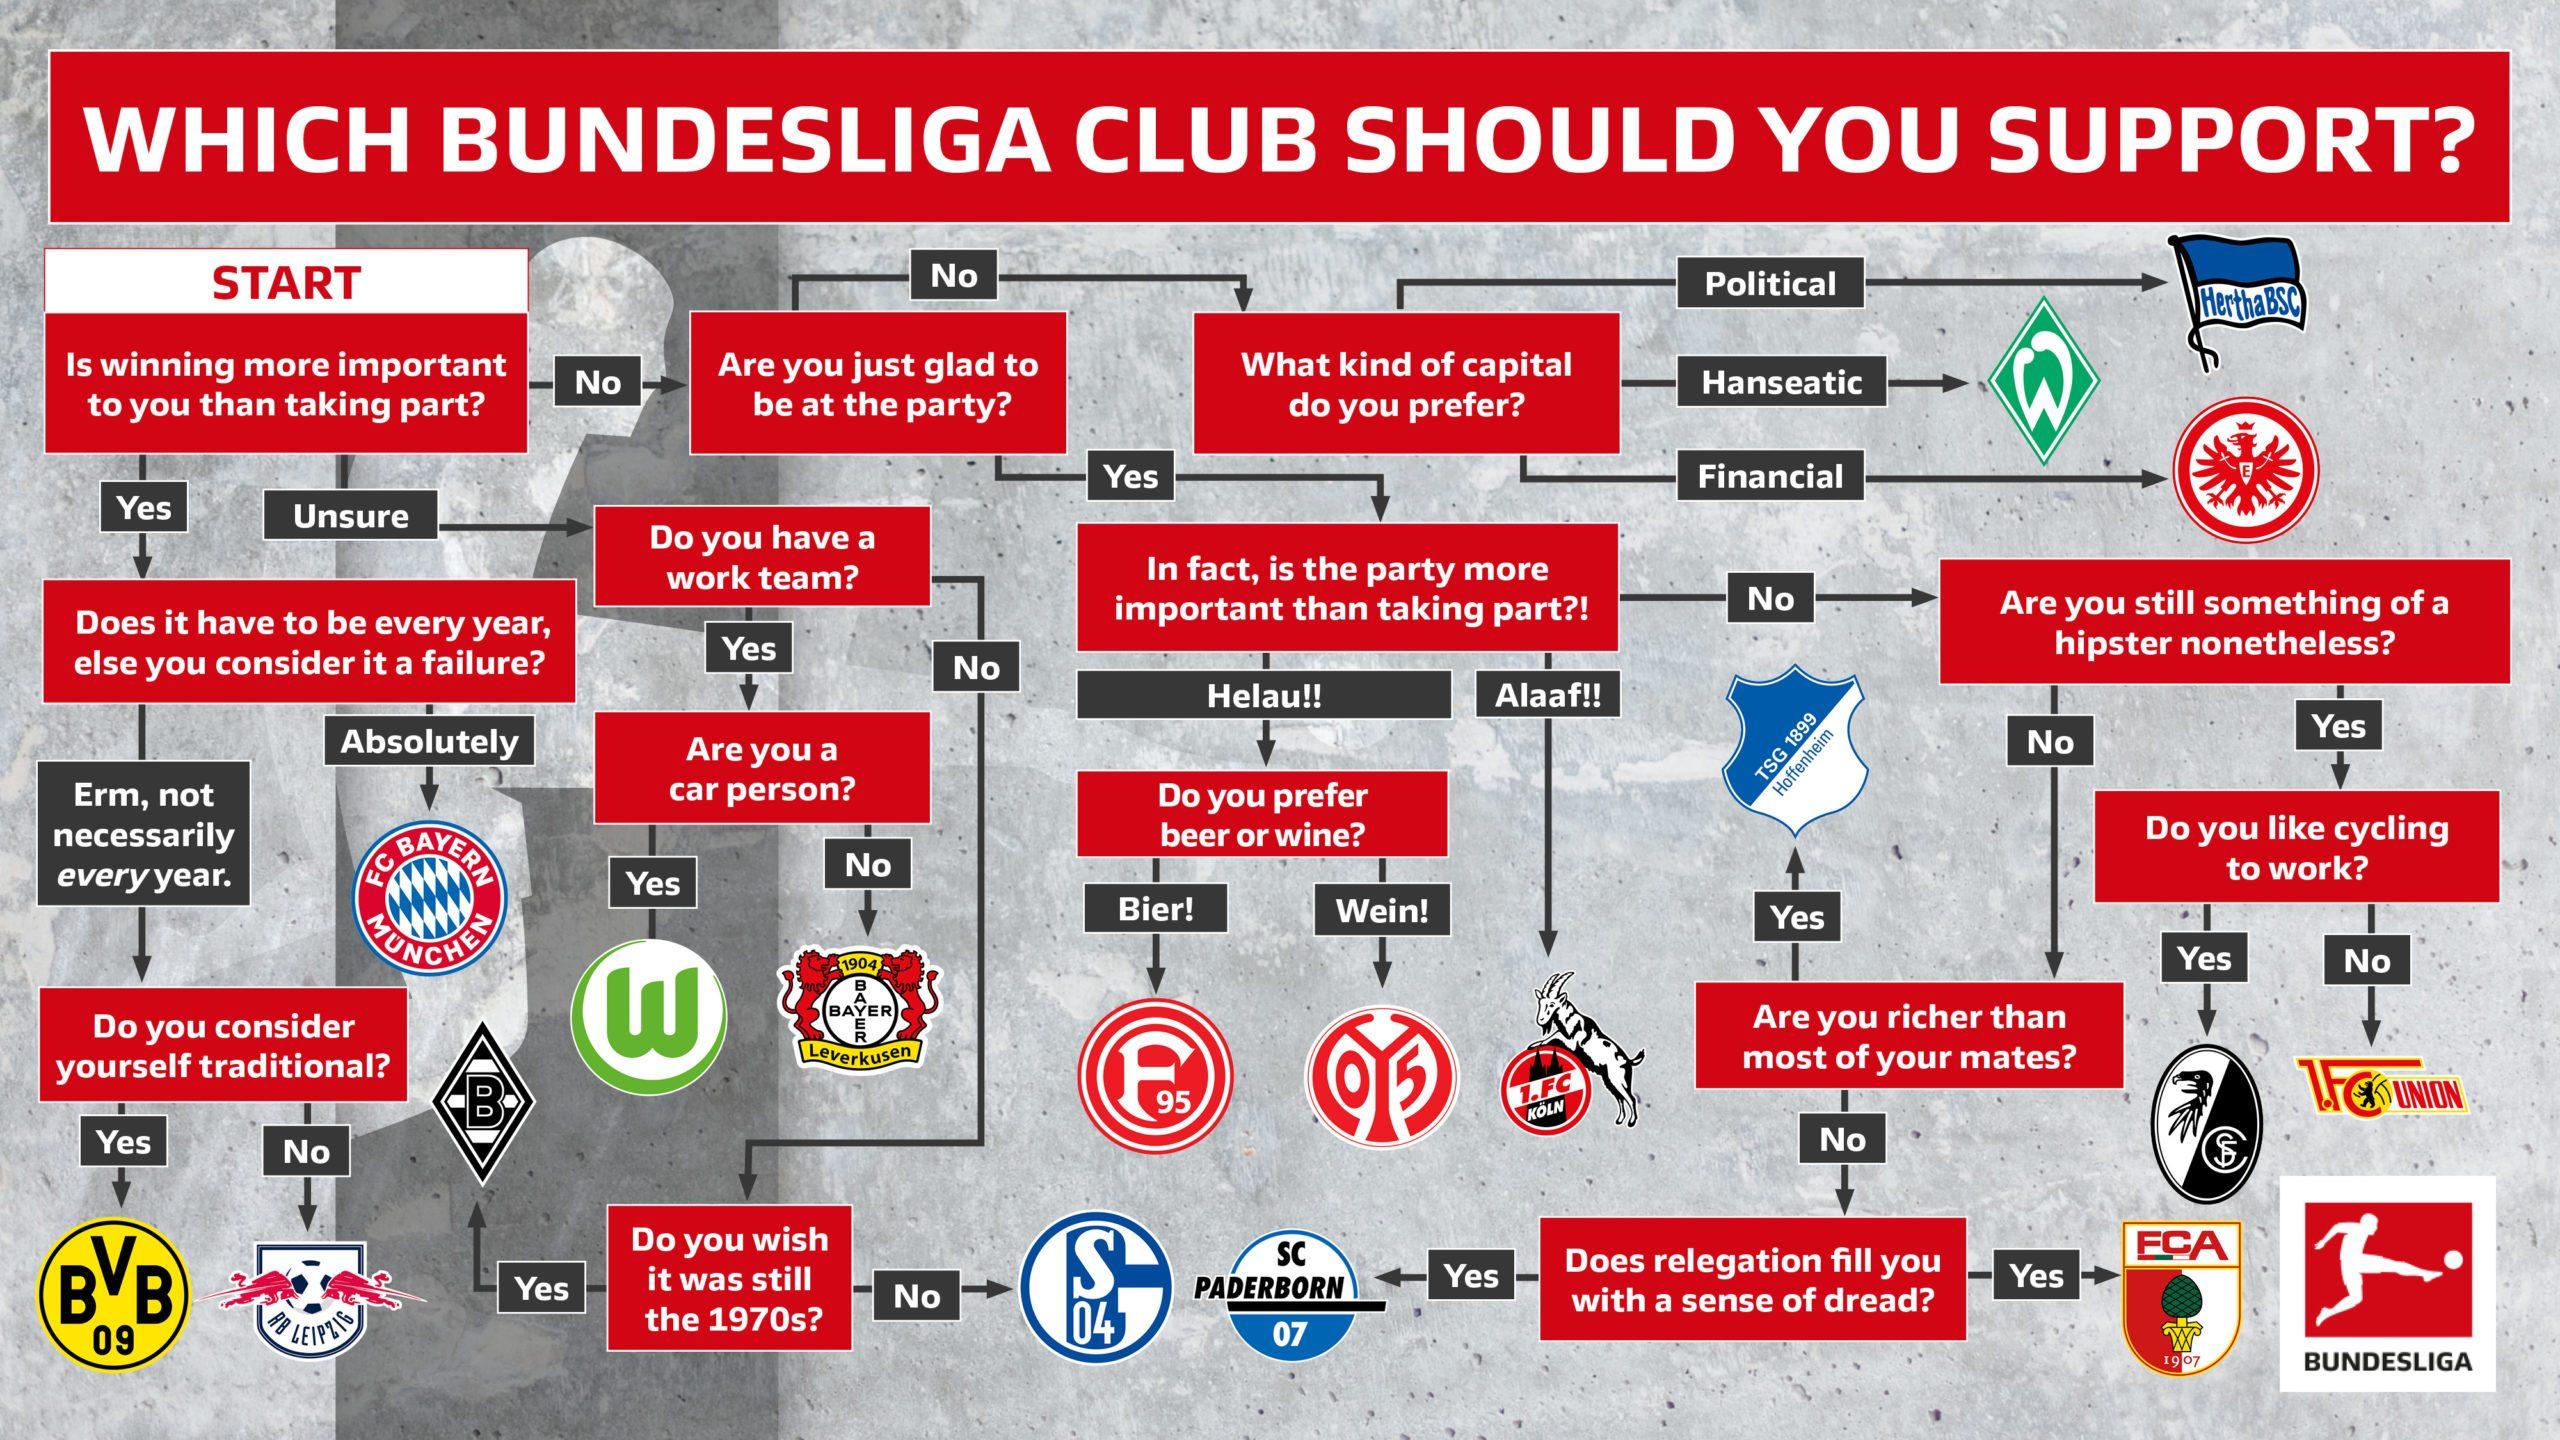 Which Bundesliga club should I support?